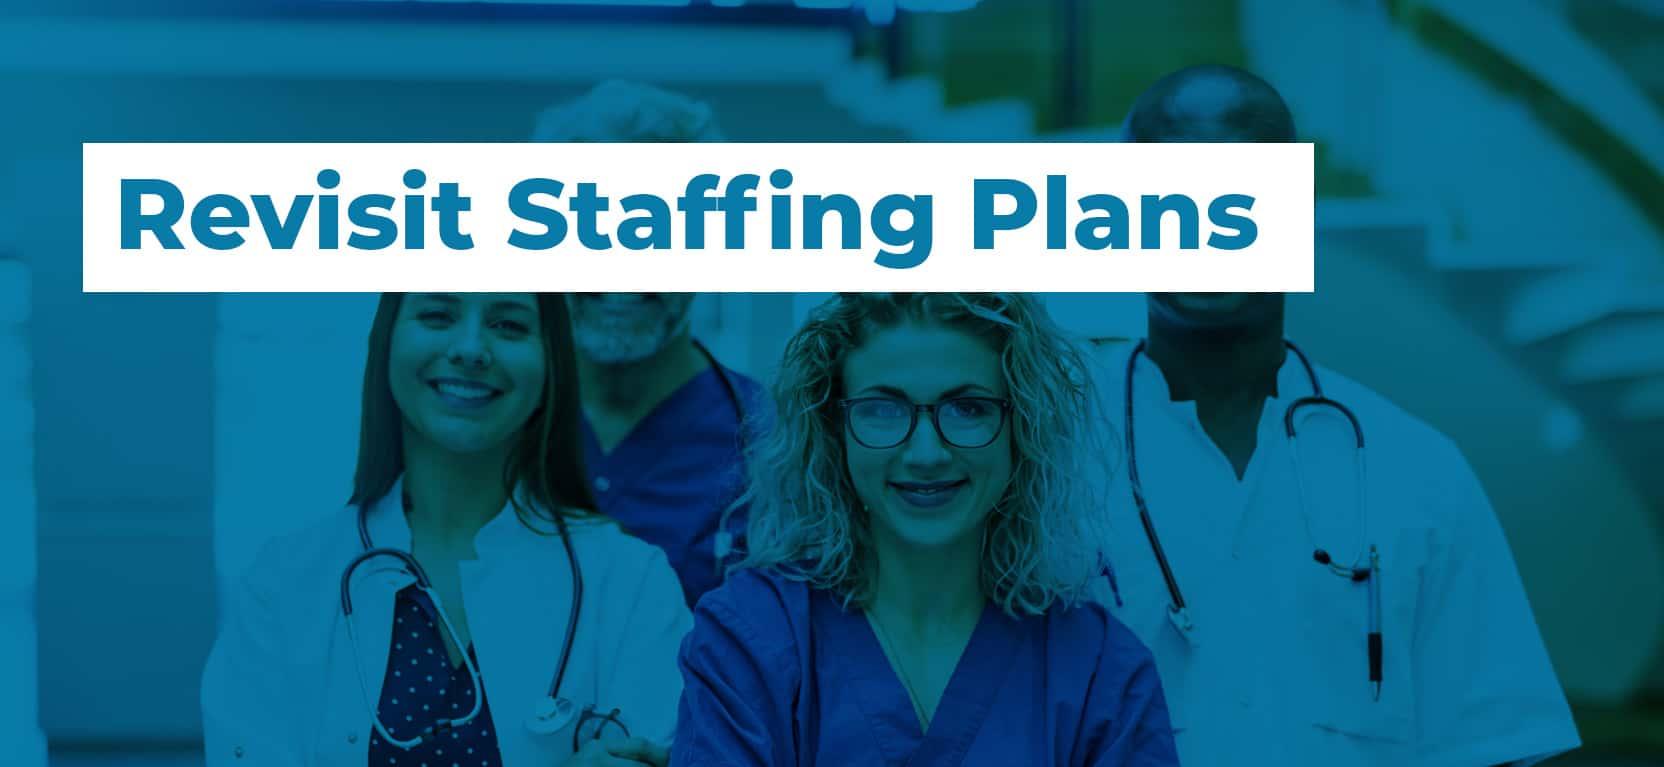 11 Revisit Staffing Plans3